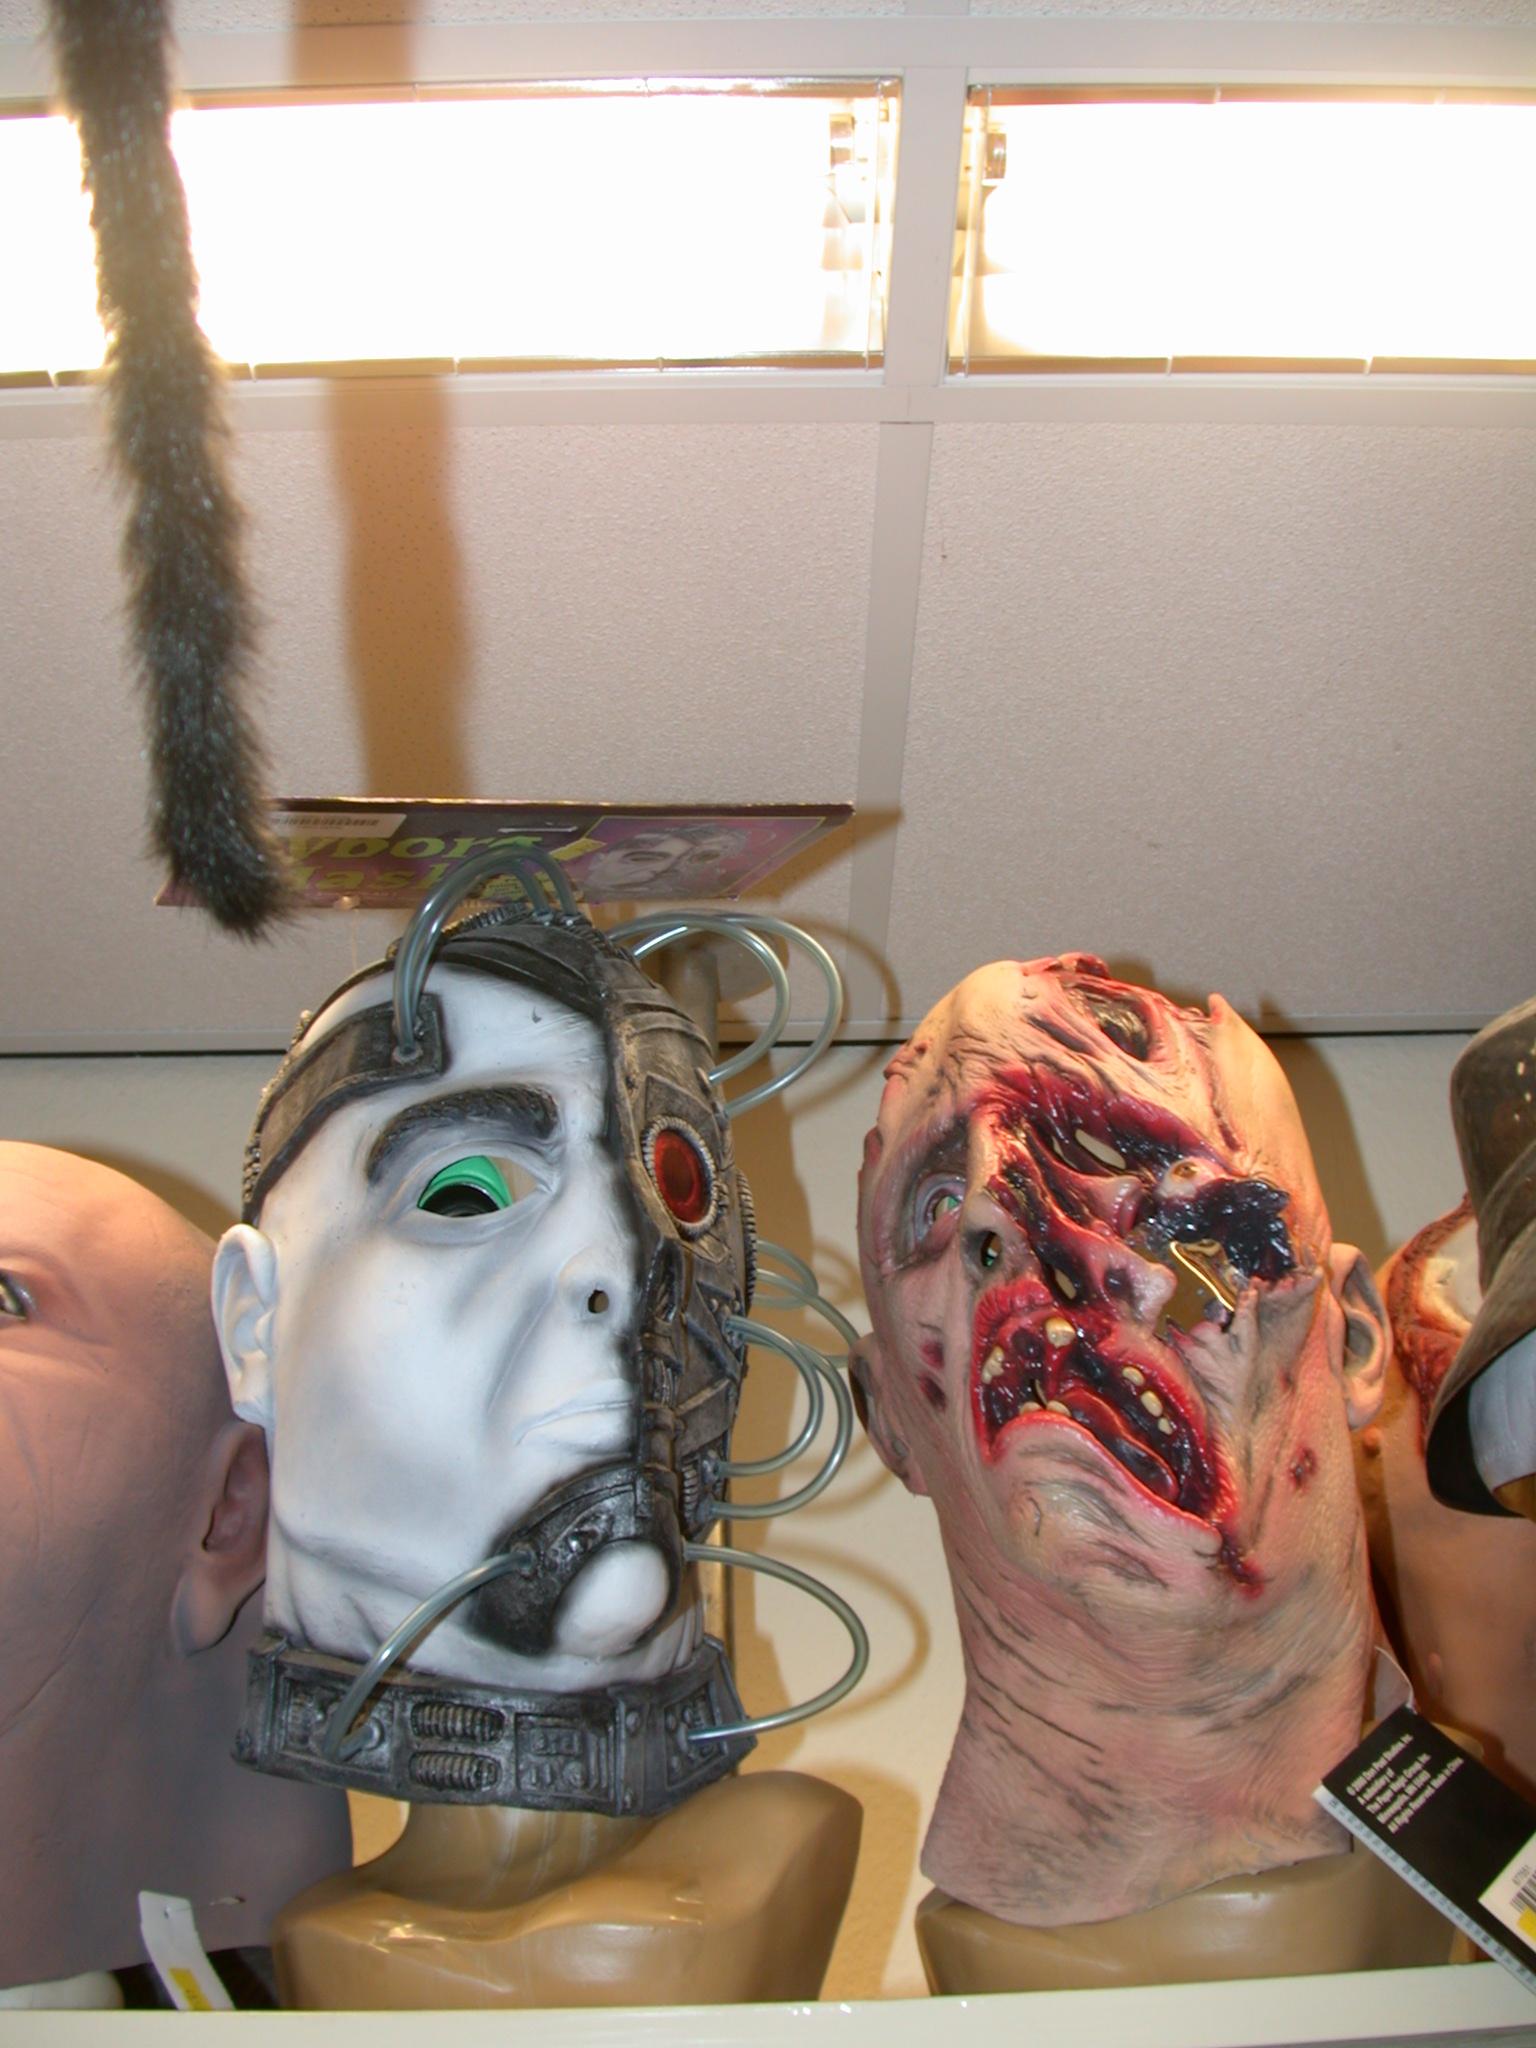 mask monster monsters plastic halloween zombie borg jean-luc picard locutus star trek